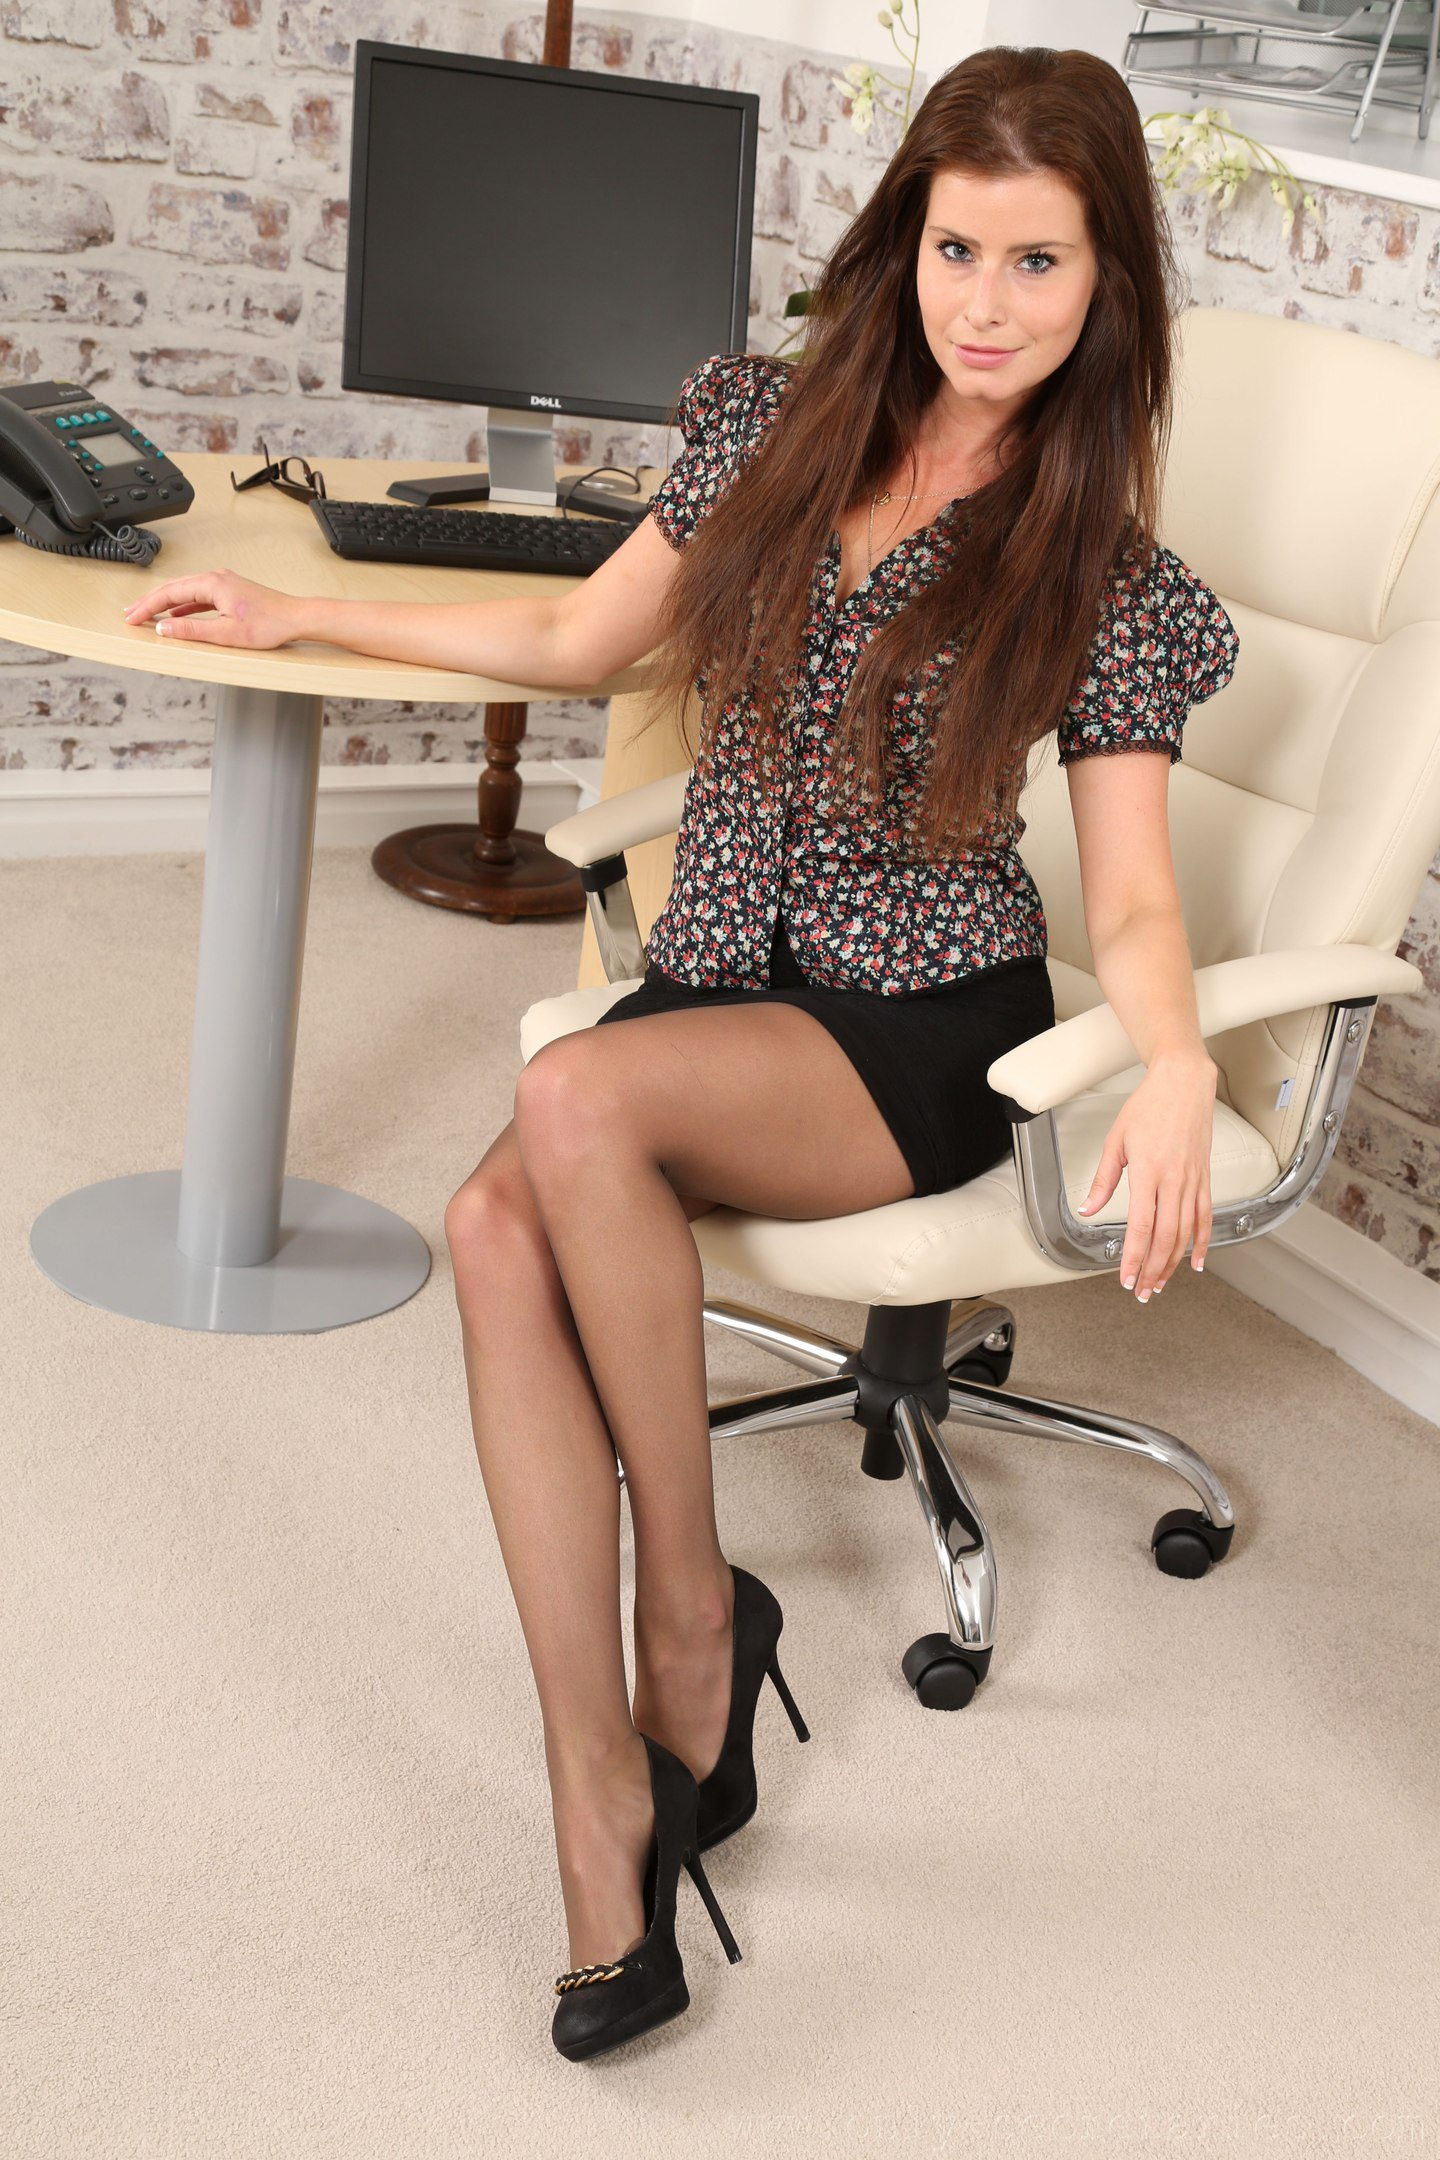 [Only-Secretaries] Kamila A #7111